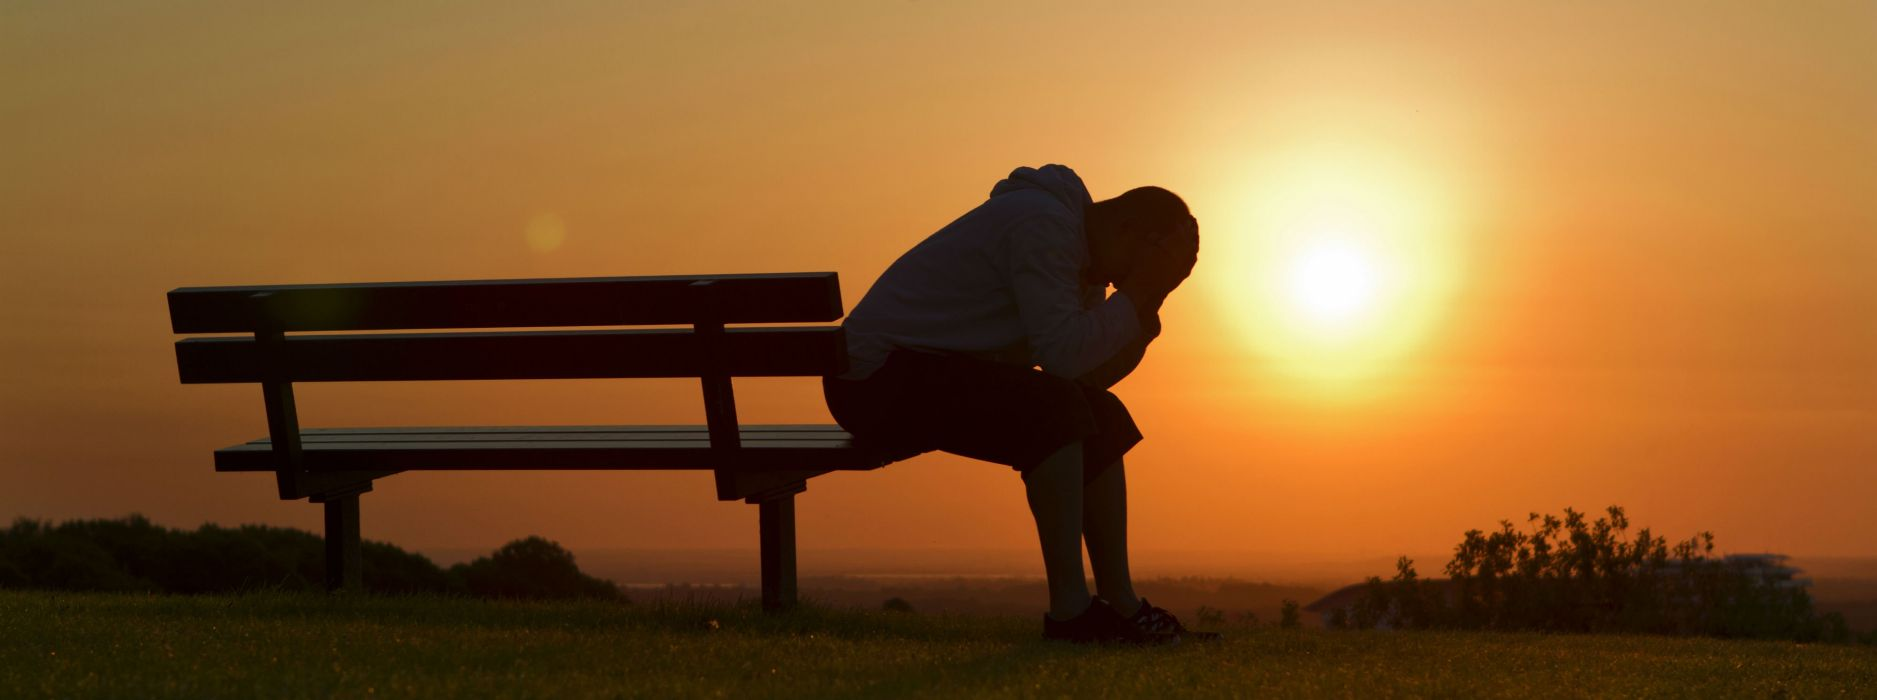 Sad Girl Sitting Alone Hd Wallpapers Sad Mood Sorrow Dark People Love Sunset Wallpaper